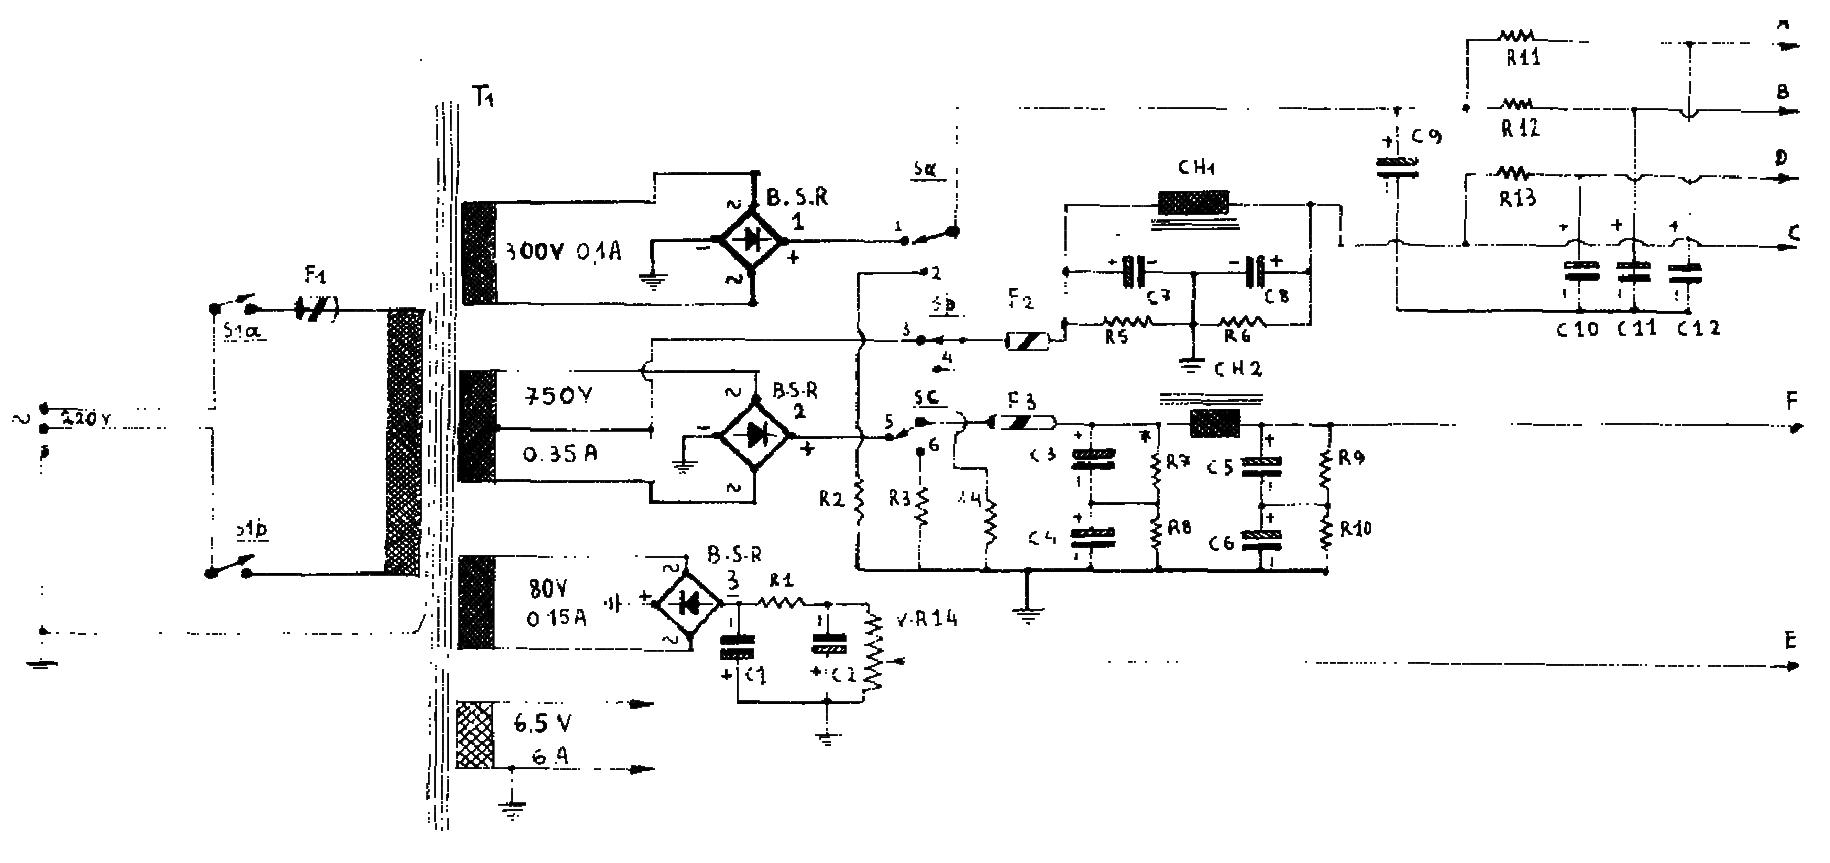 Rf Transmitters 255w Valve Transmitter Circuit L60699 Oscillator Circuits Nextgr The Power Supply